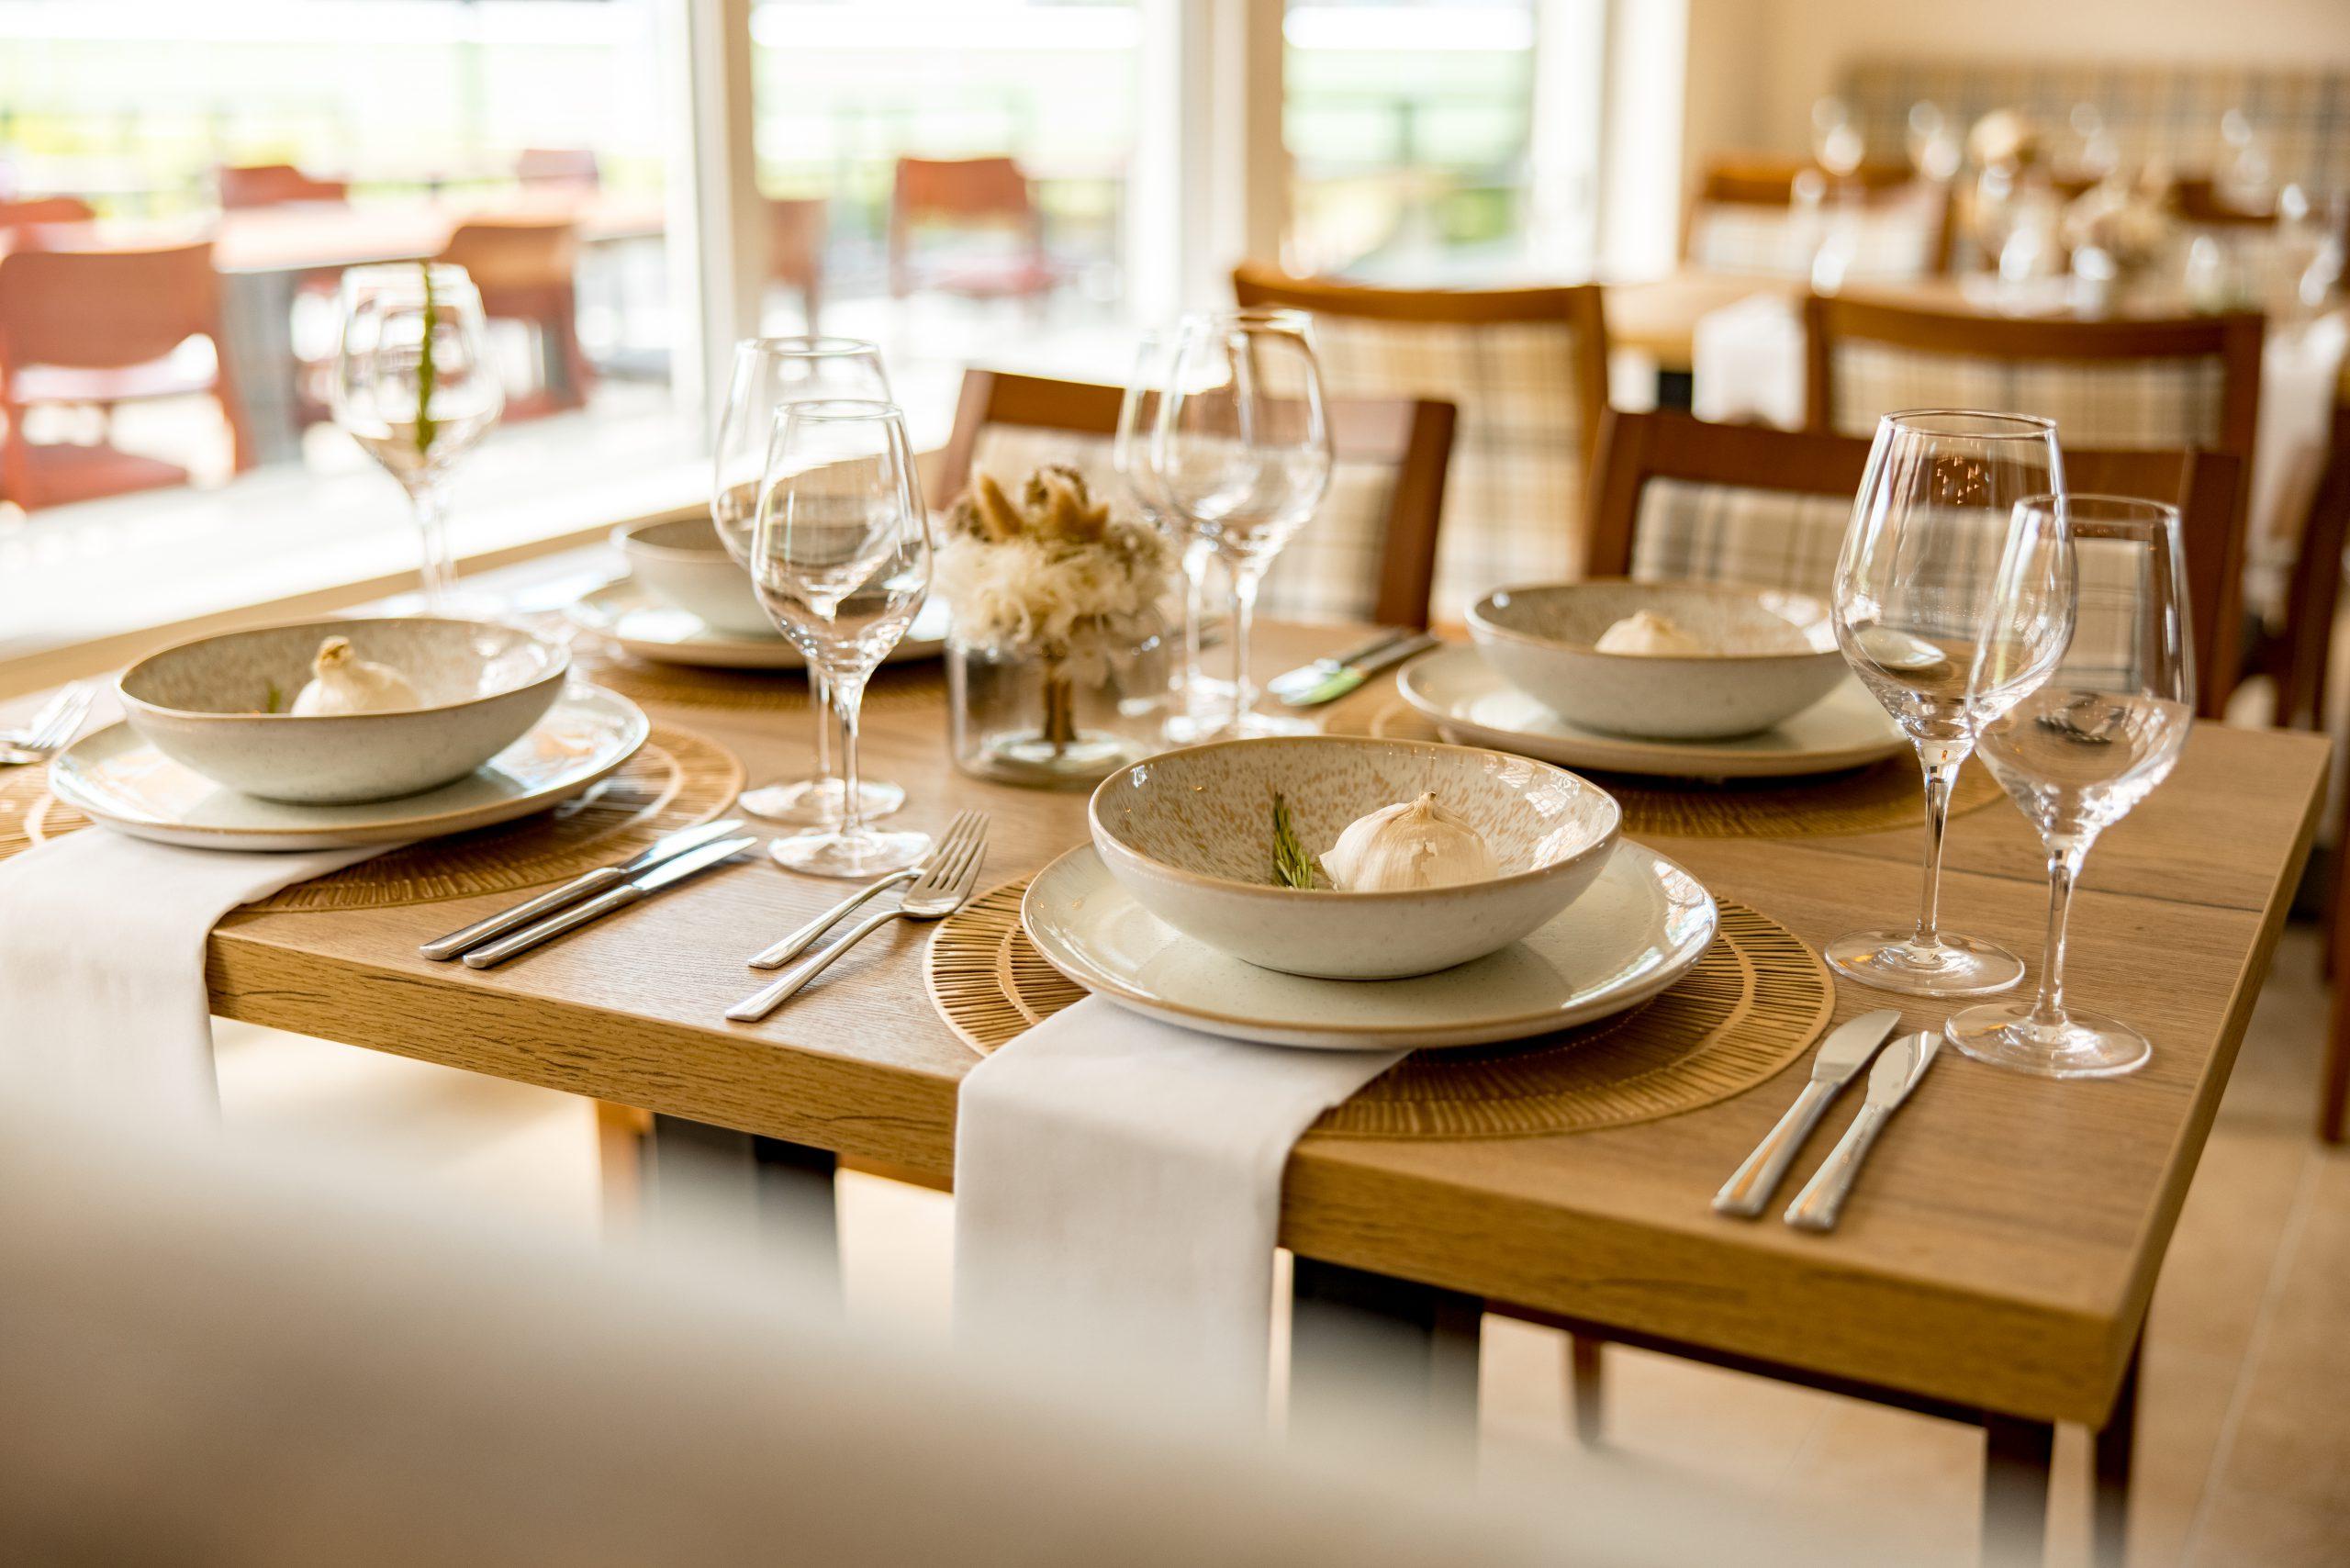 Bild 1 Restaurant Herzberg